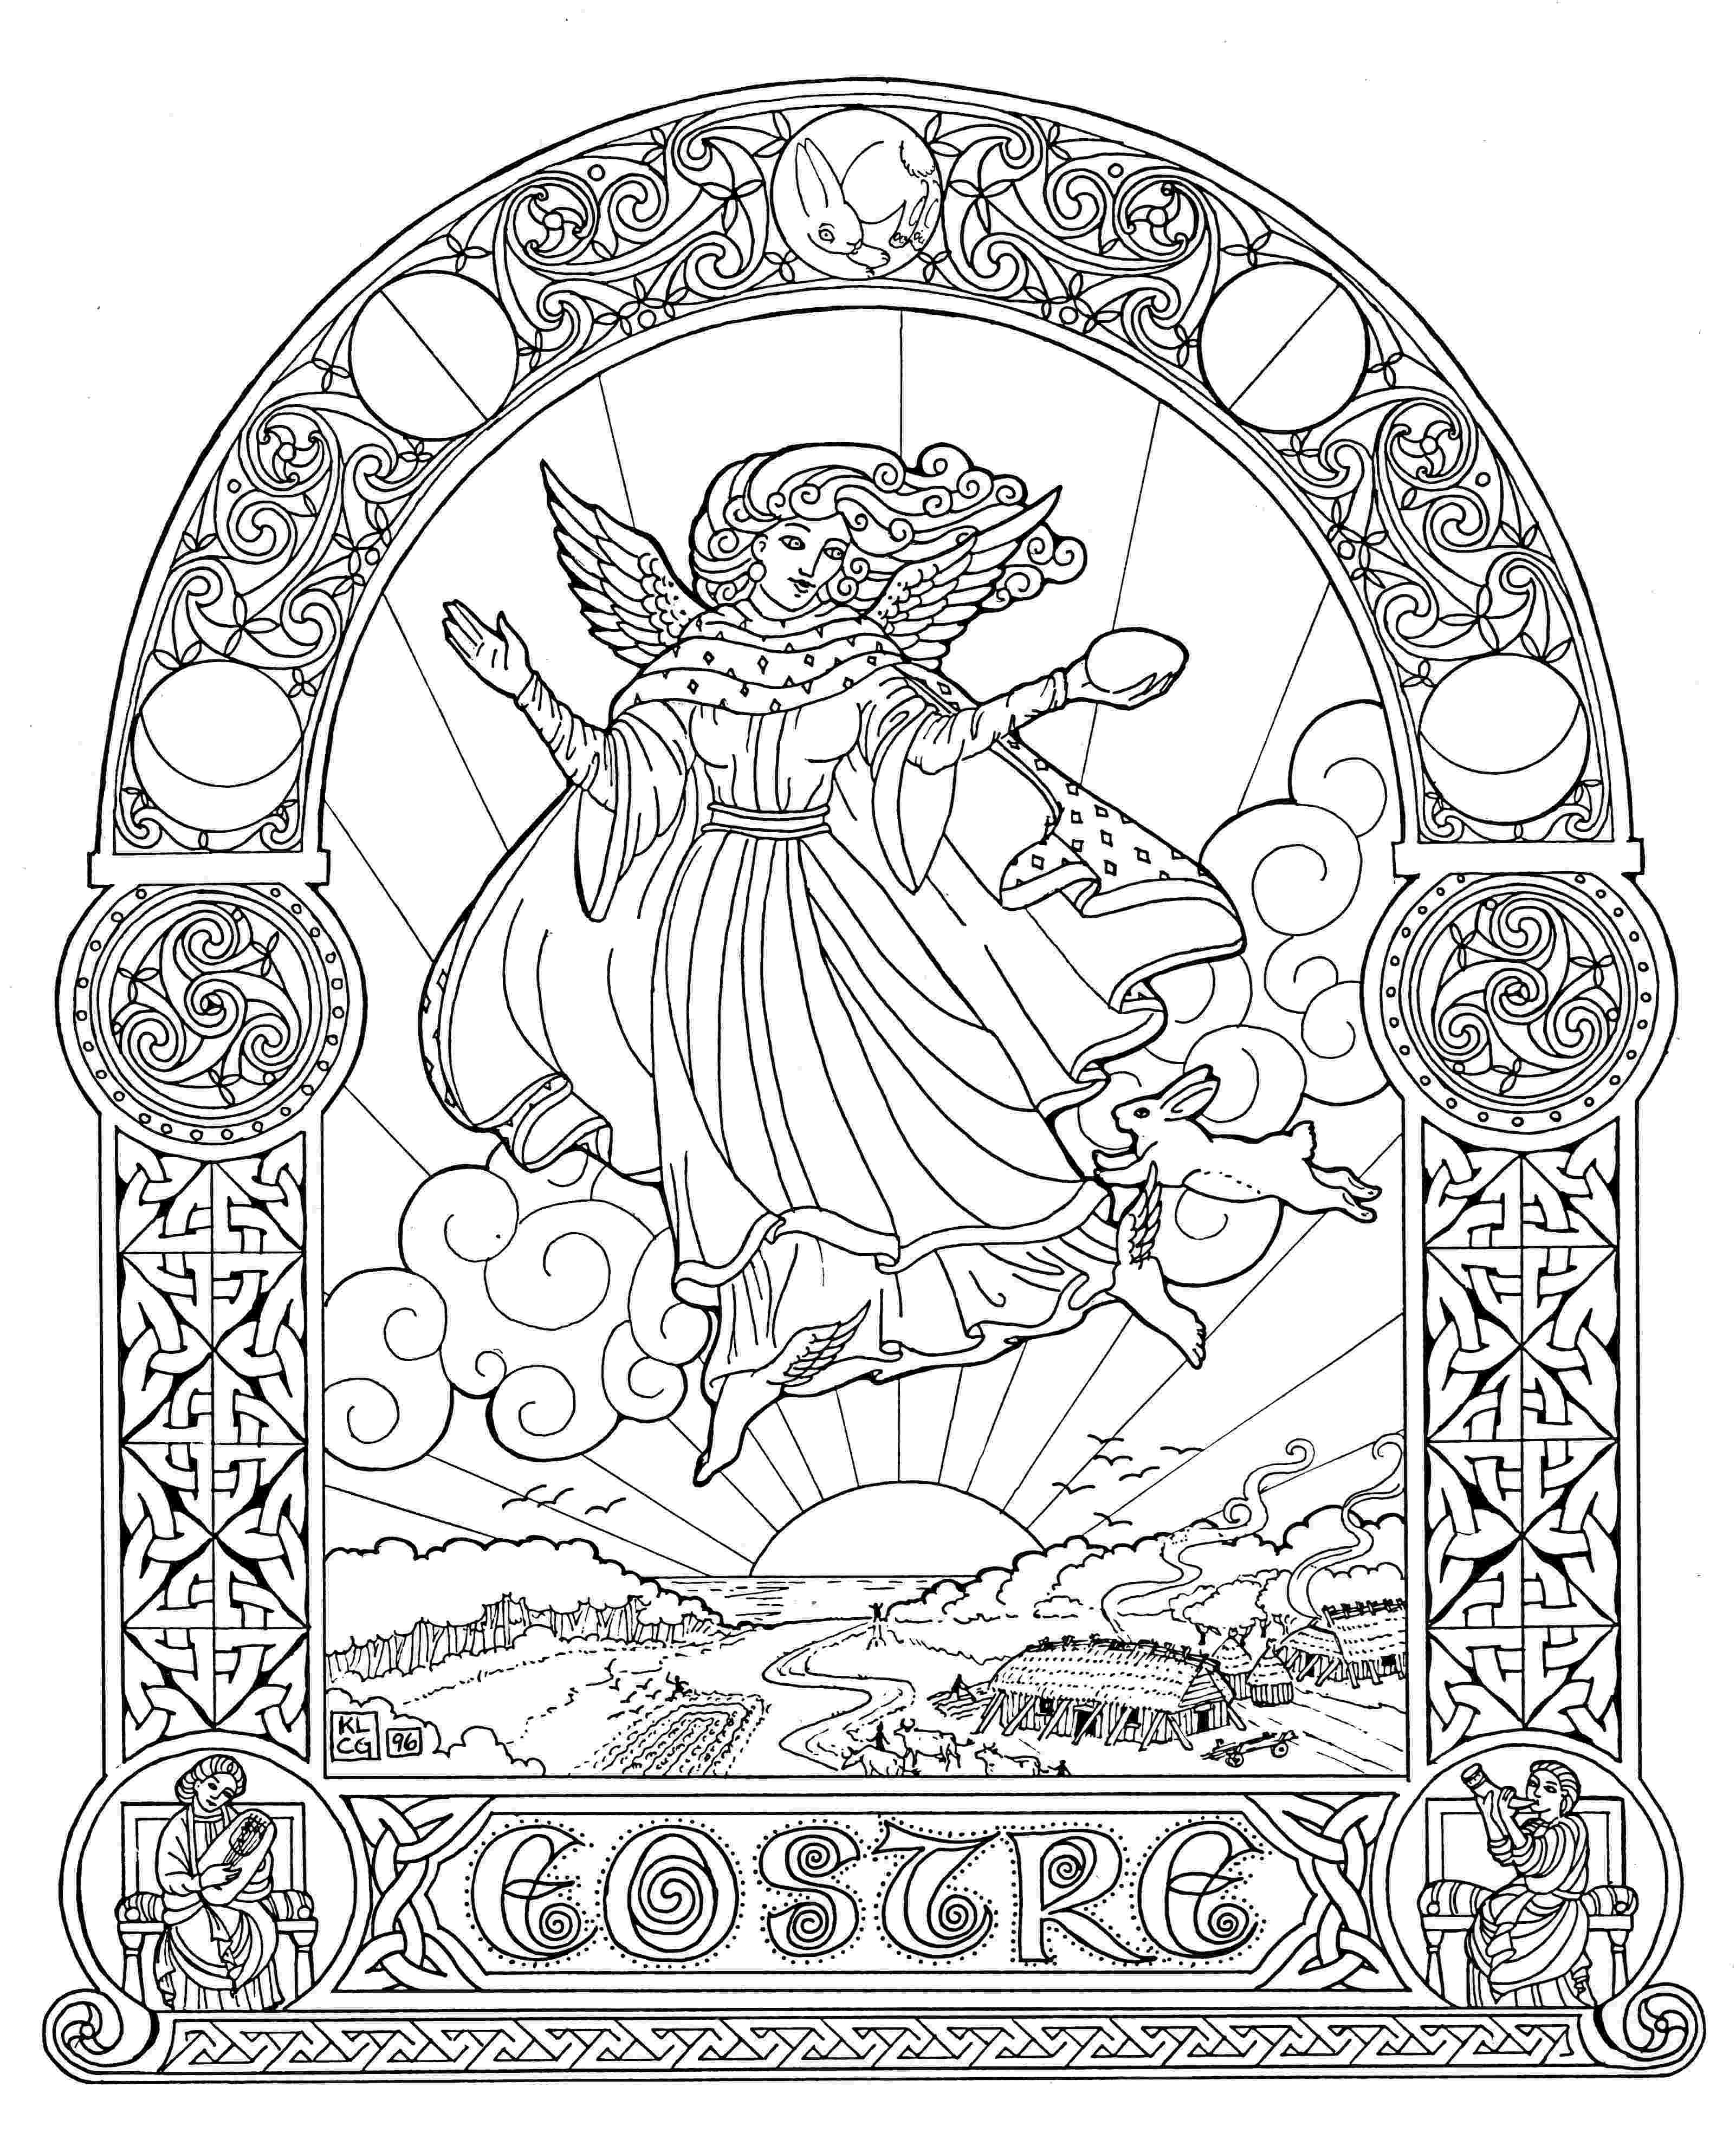 celtic art colouring pages embellishing and colouring celtic design karen gillmore art pages art celtic colouring